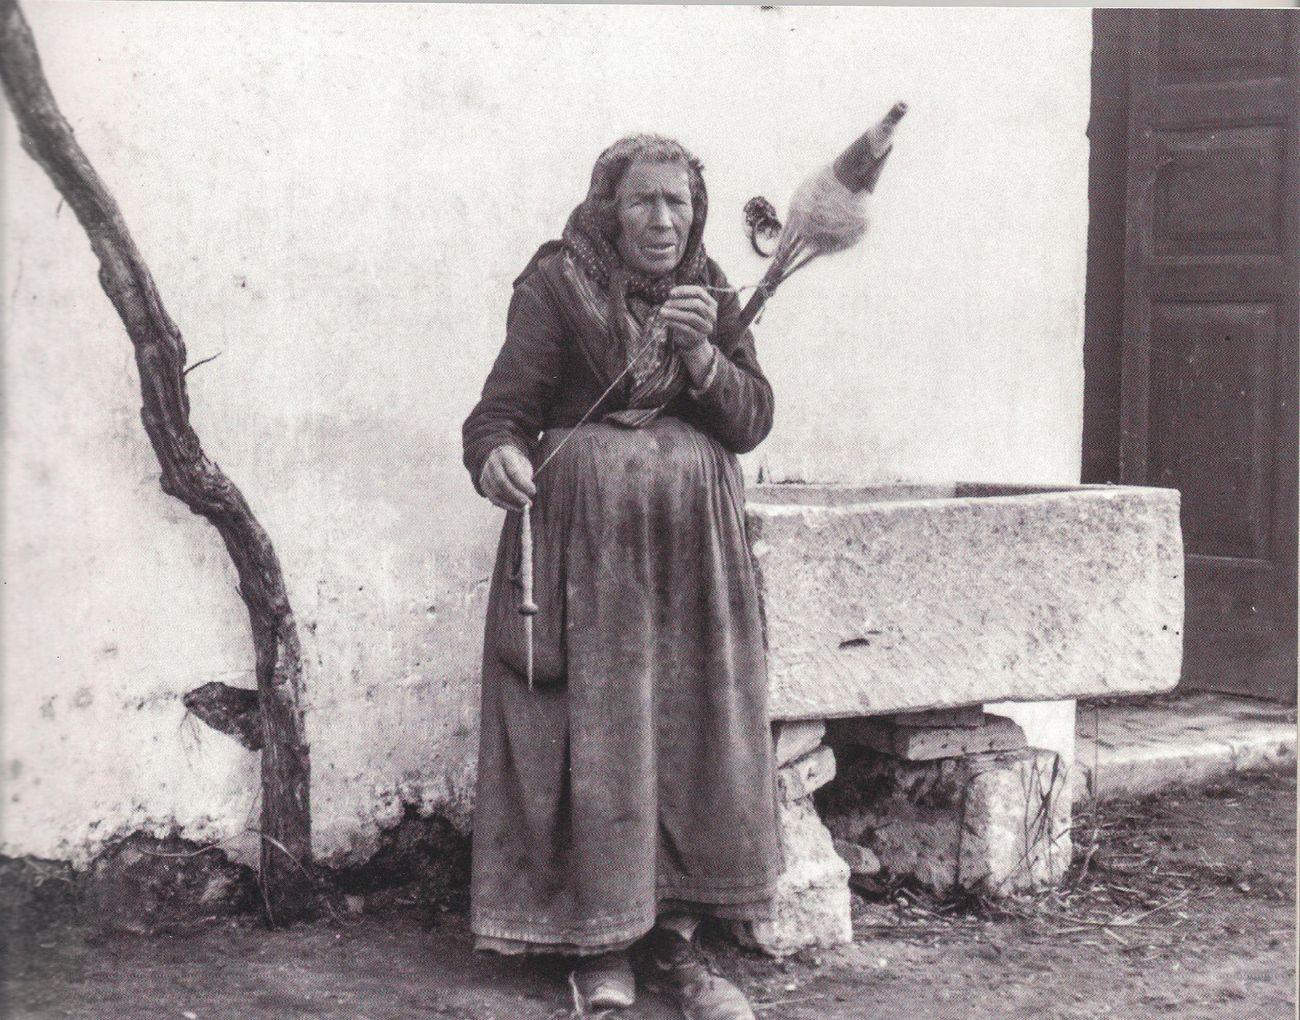 Giuseppe Palumbo, Contadina, 1907